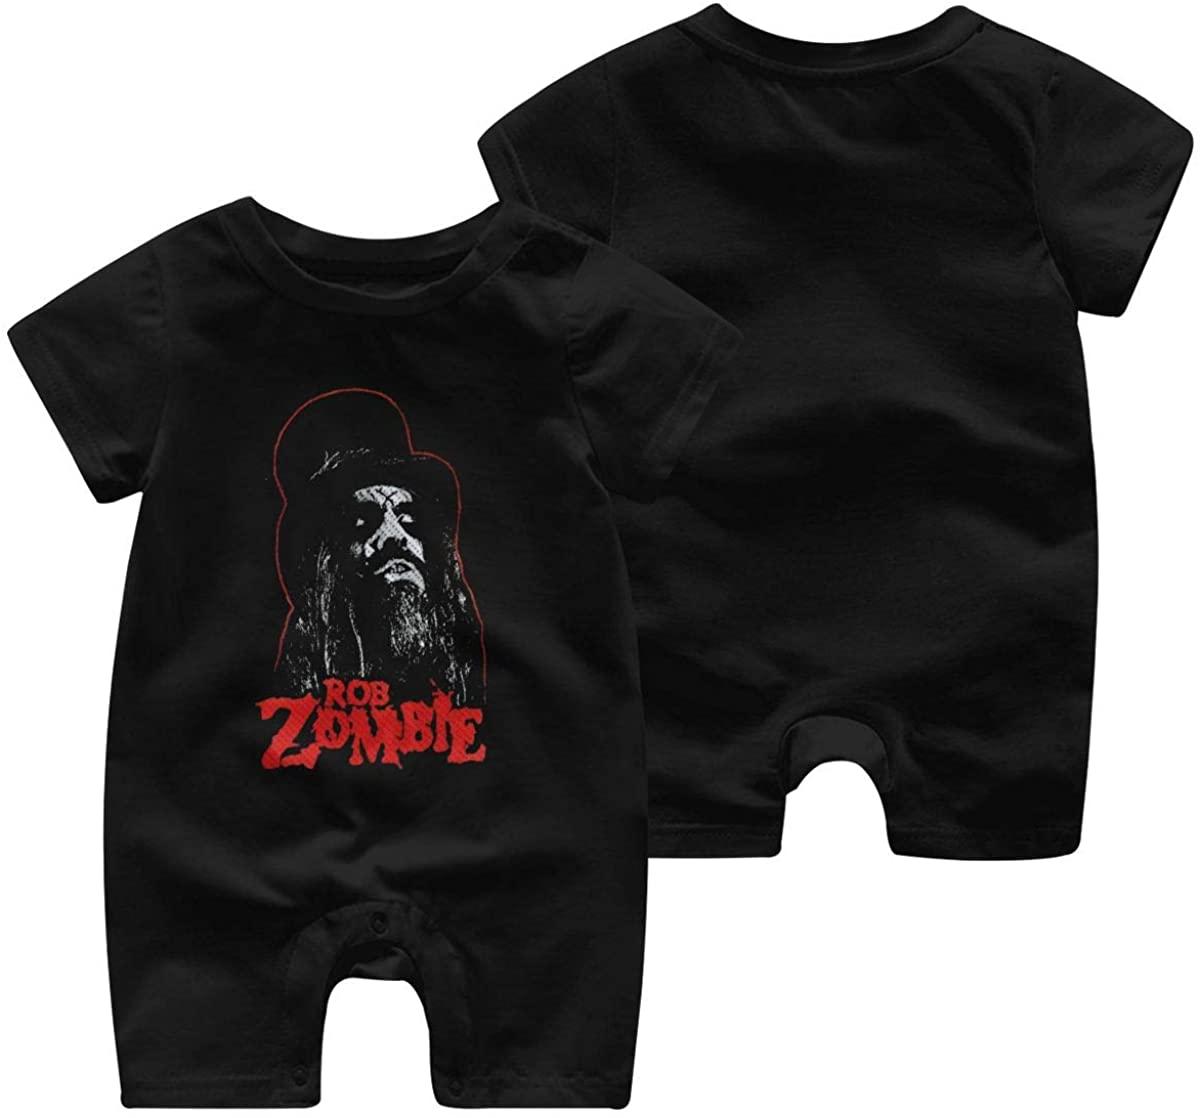 Qwertyi Rob Zombie Baby Jersey Boys Girls Jumpsuit Bodysuit